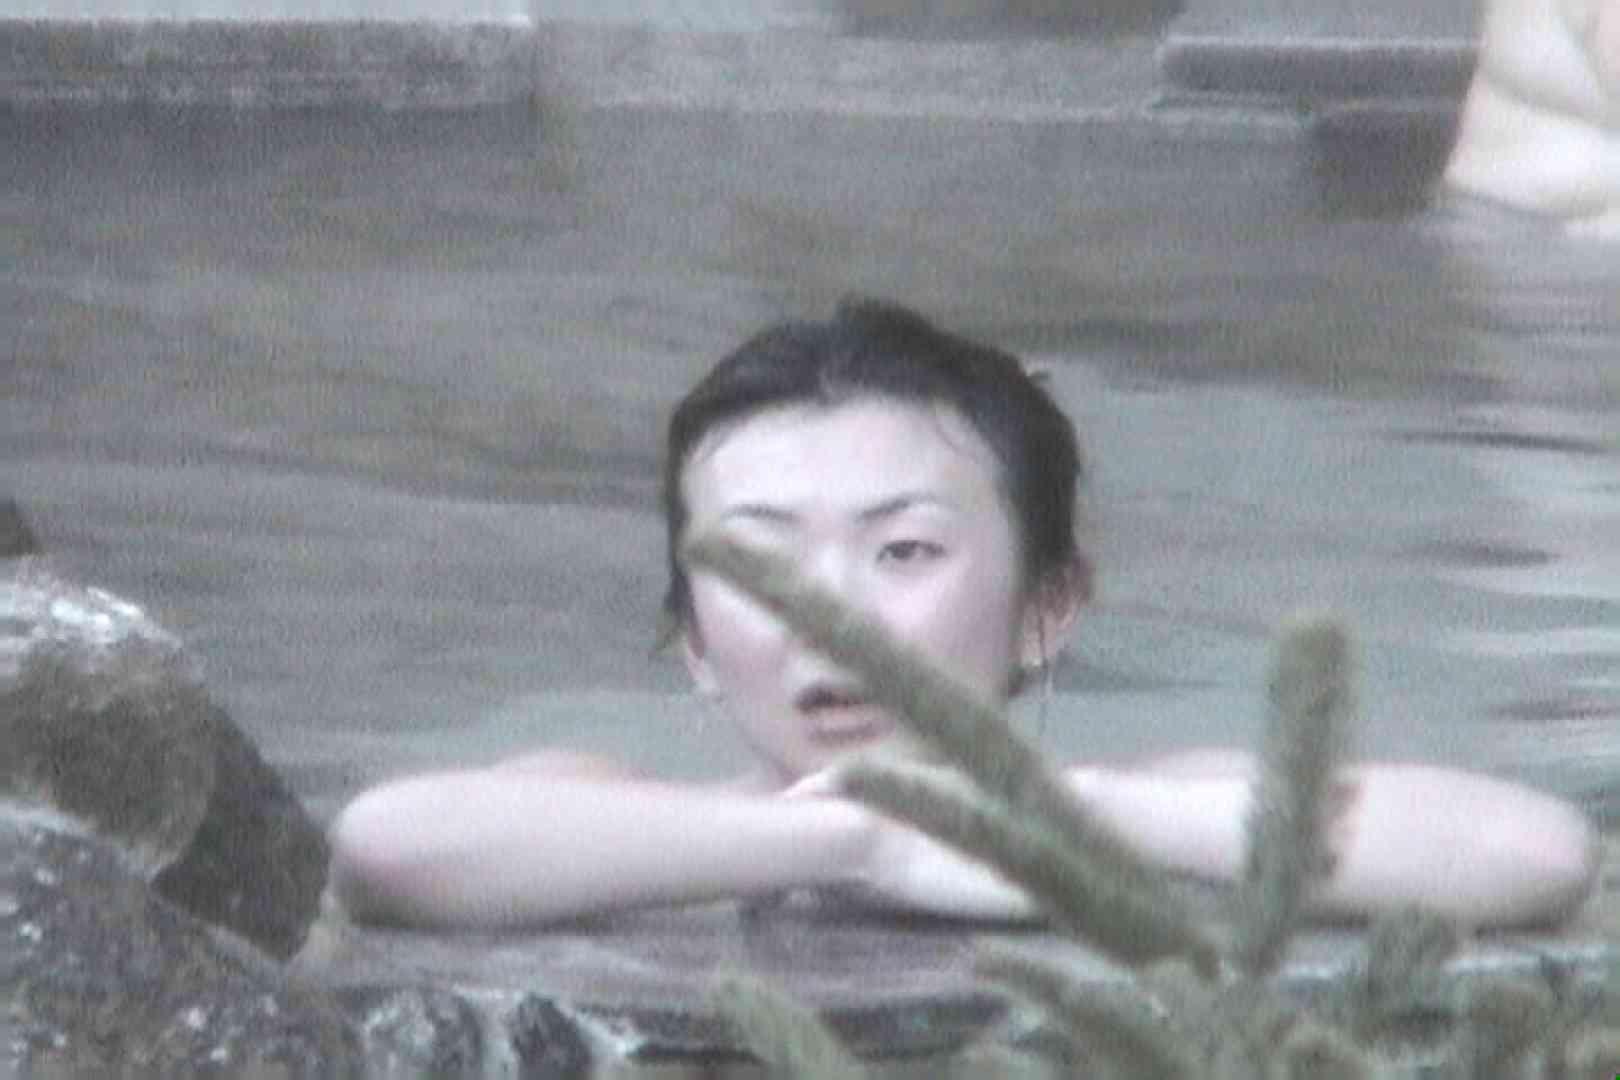 Aquaな露天風呂Vol.561 盗撮  42pic 14